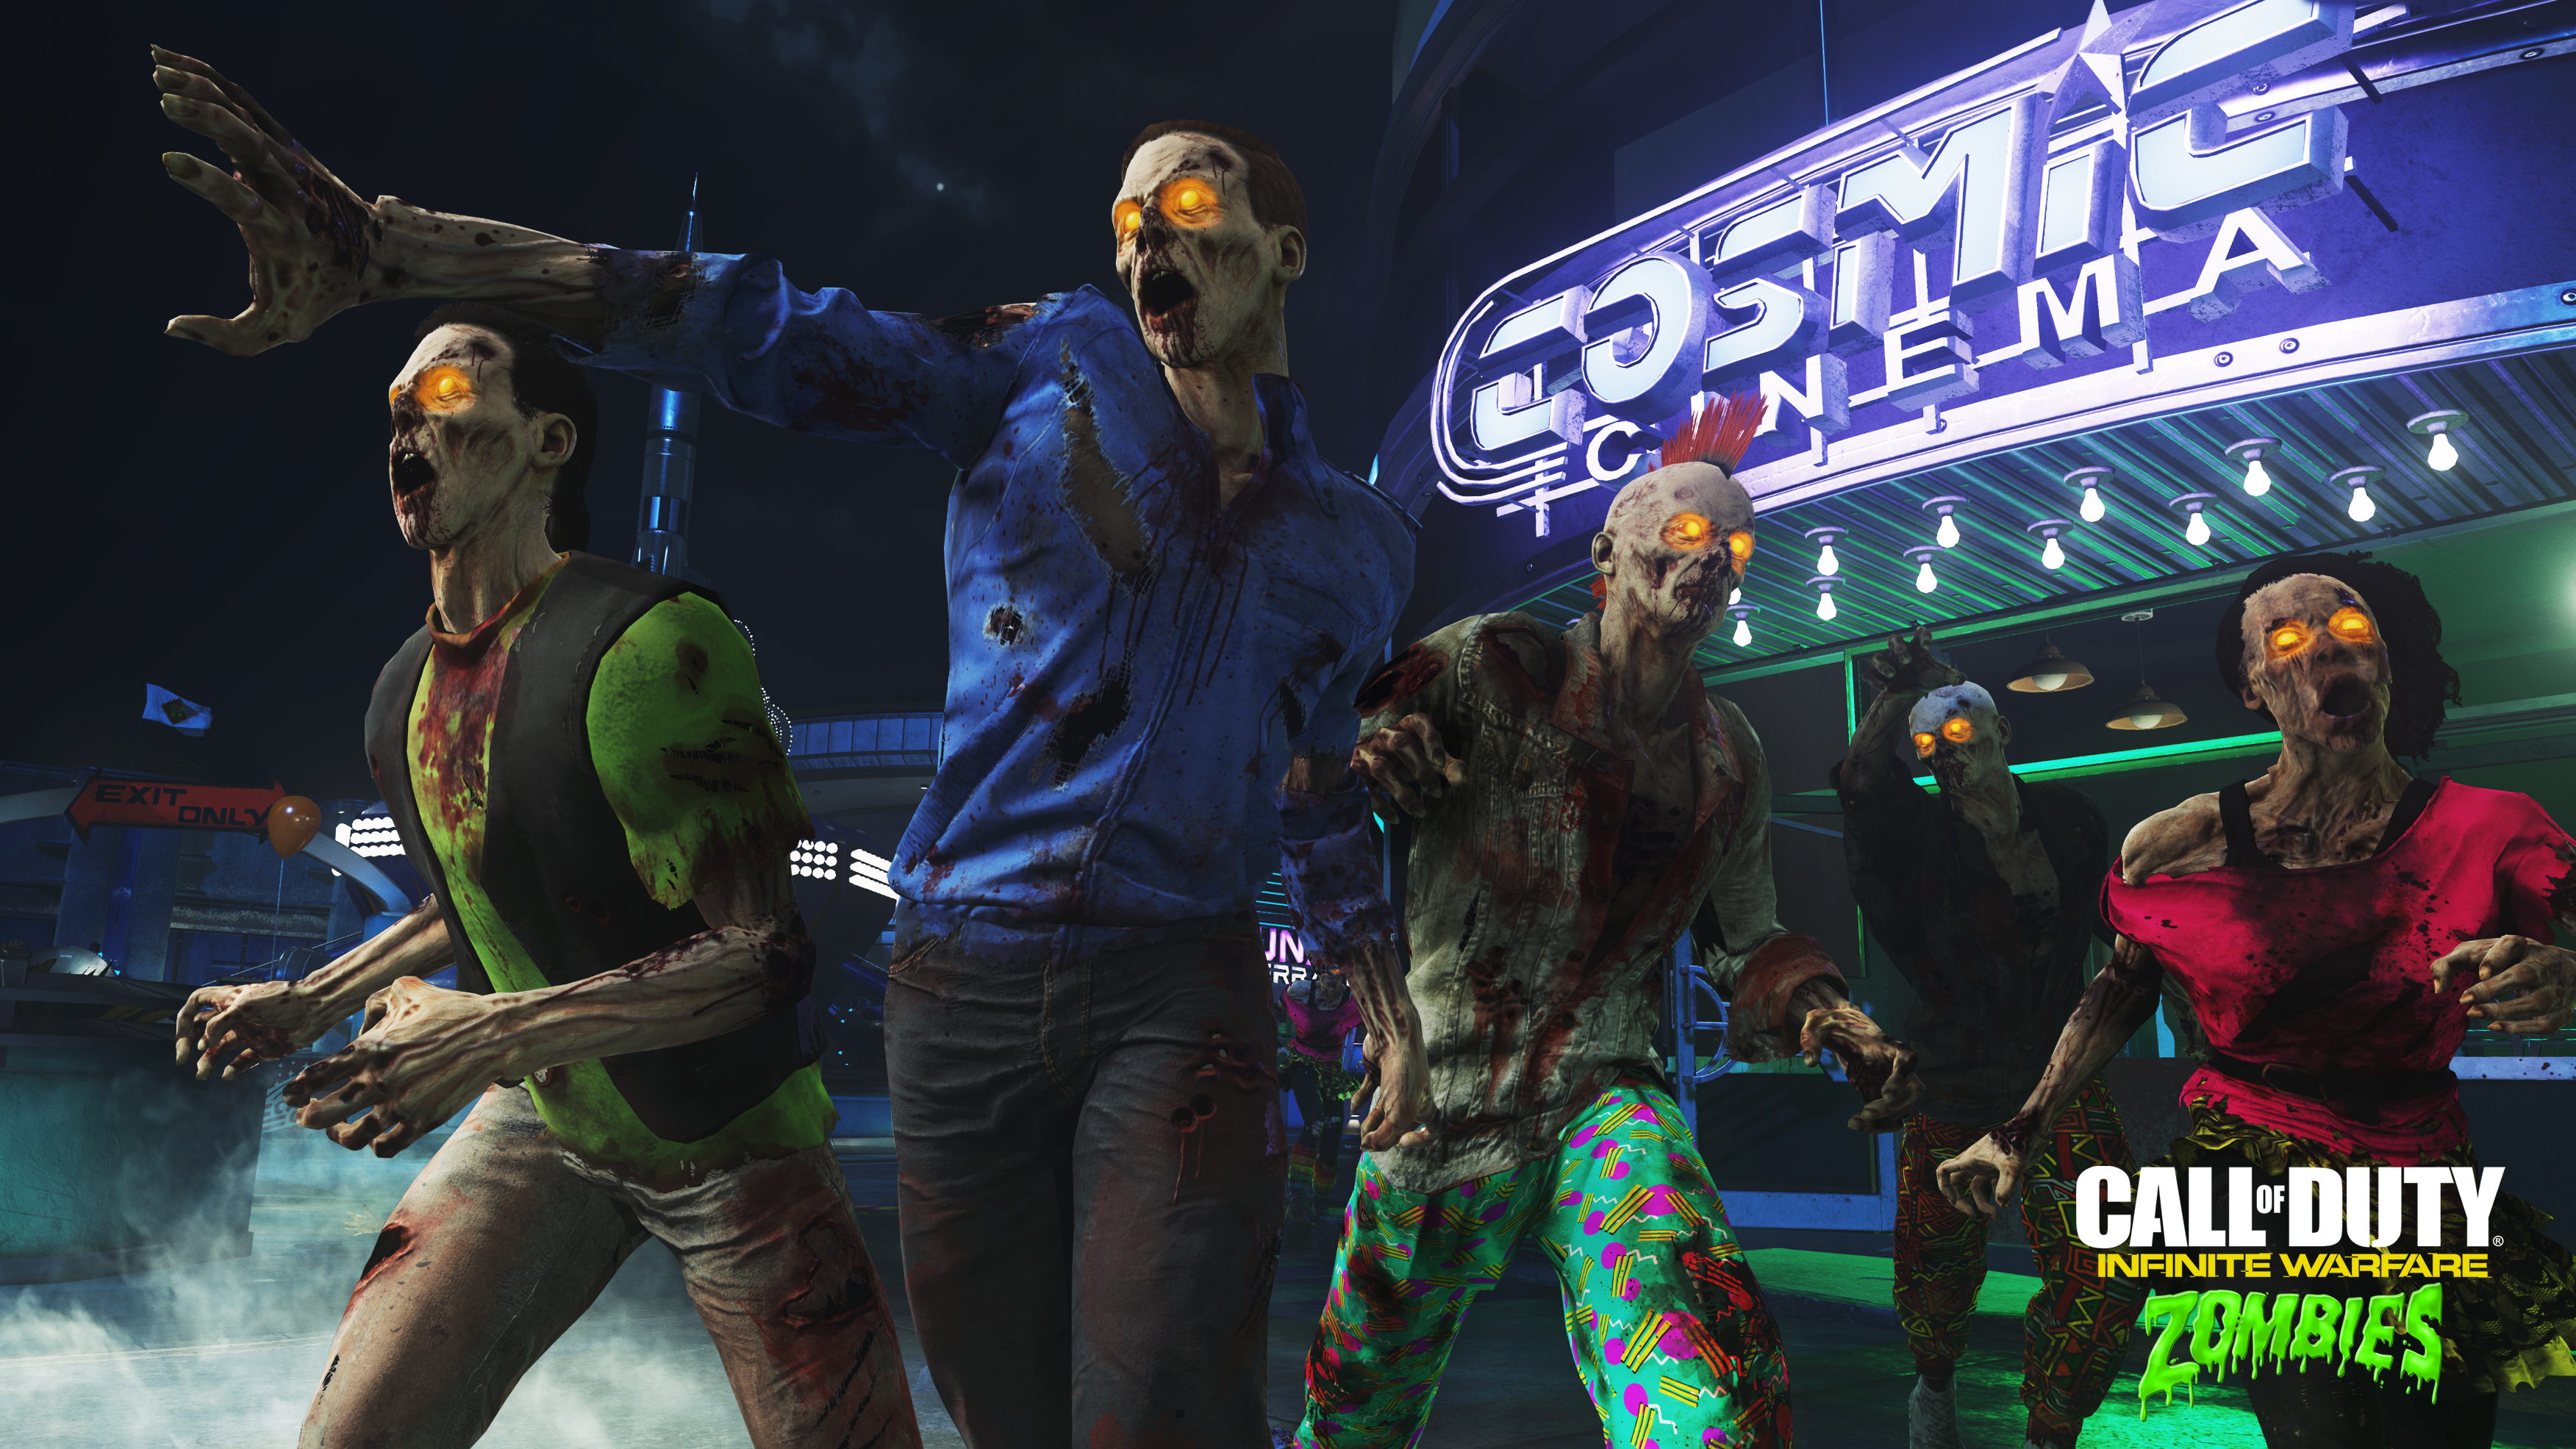 COD-Infinite-Warfare_Zombies-in-Spaceland-5_WM